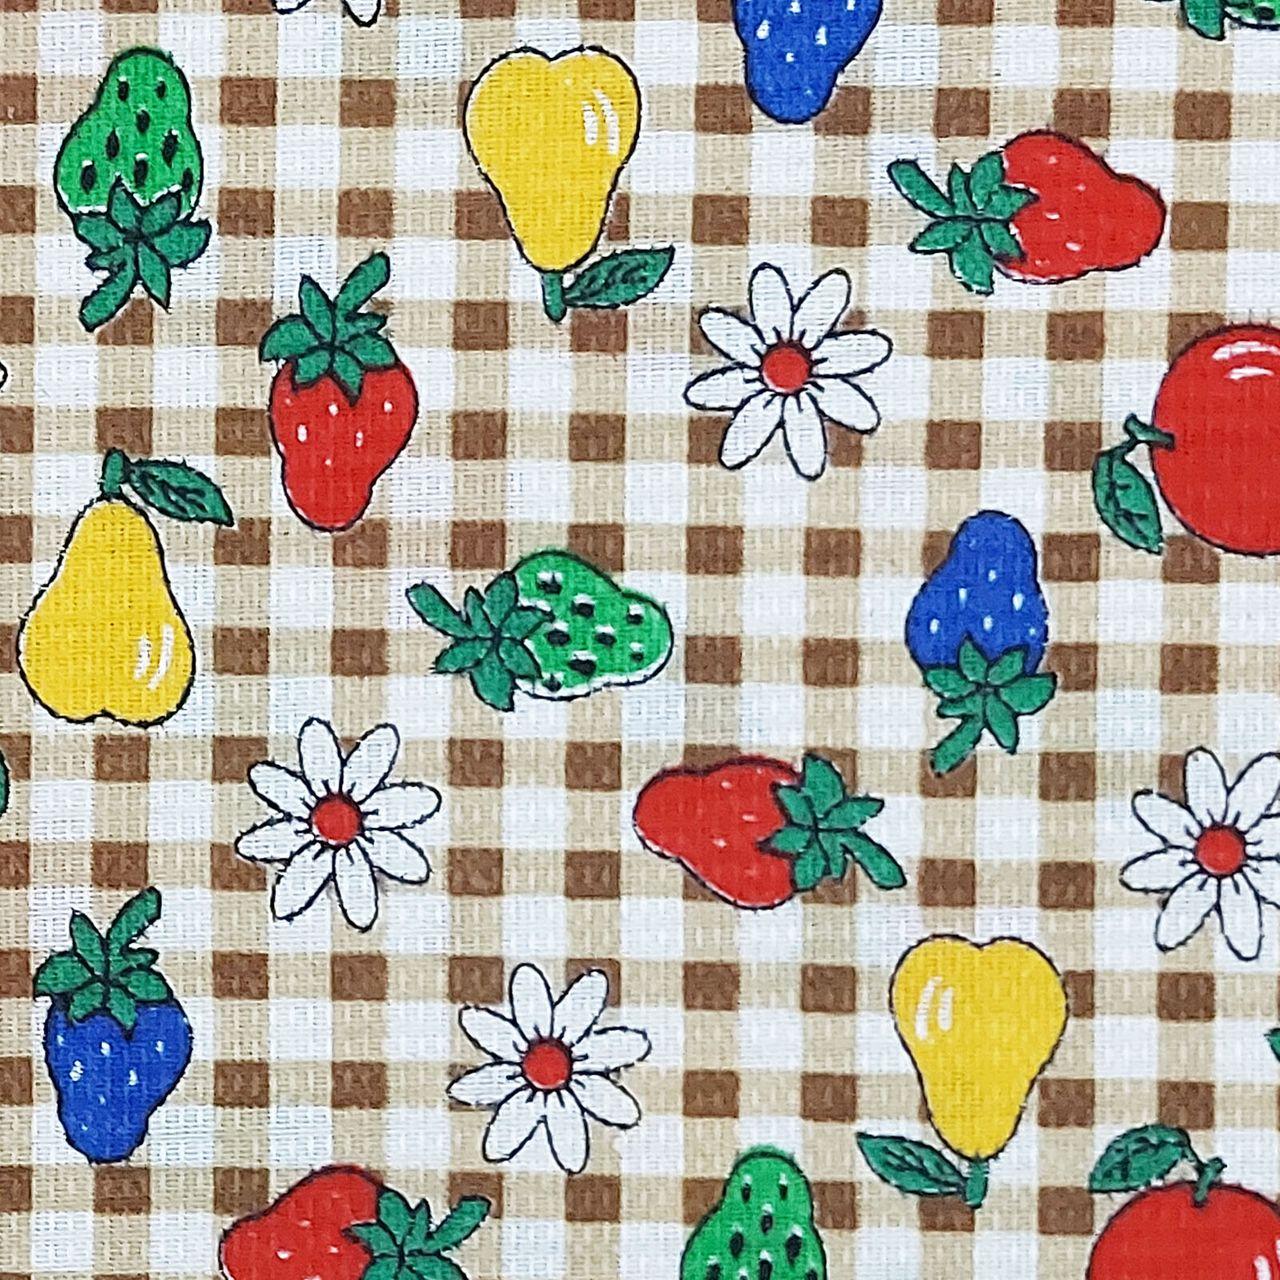 پارچه آشپزخانه طرح میوه کد 4